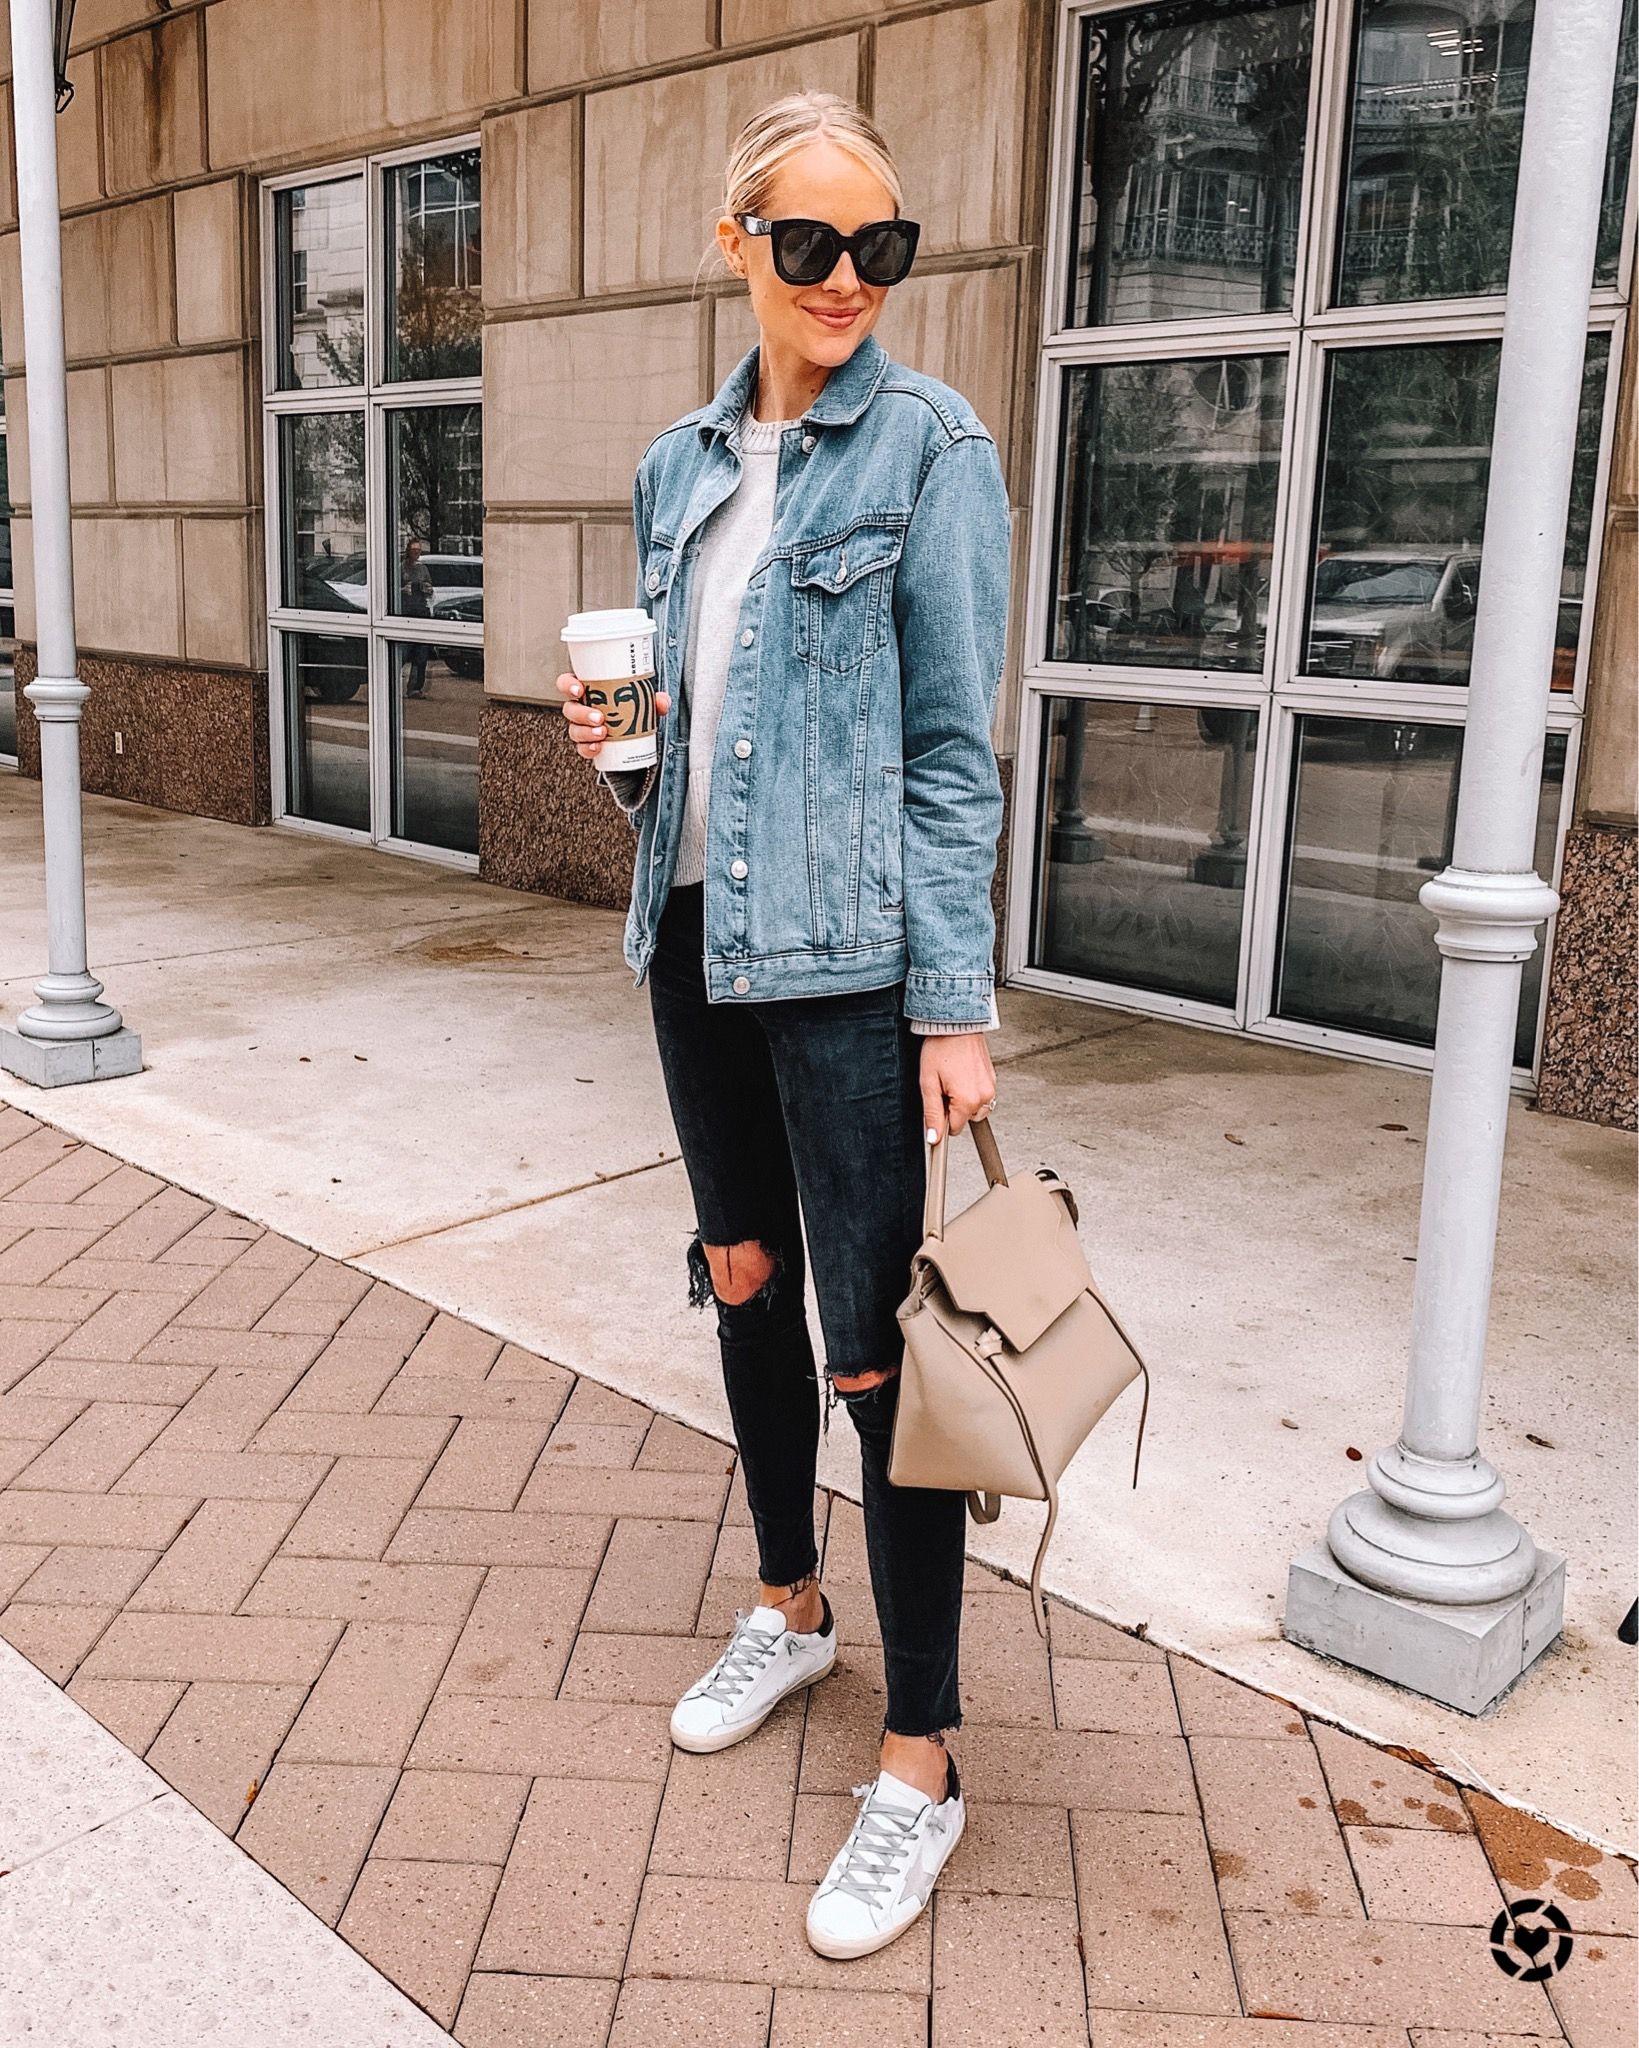 Fashion Jackson Instagram Fashion Jackson Black Ripped Skinny Jeans Oversized Denim Jacket [ 2048 x 1639 Pixel ]